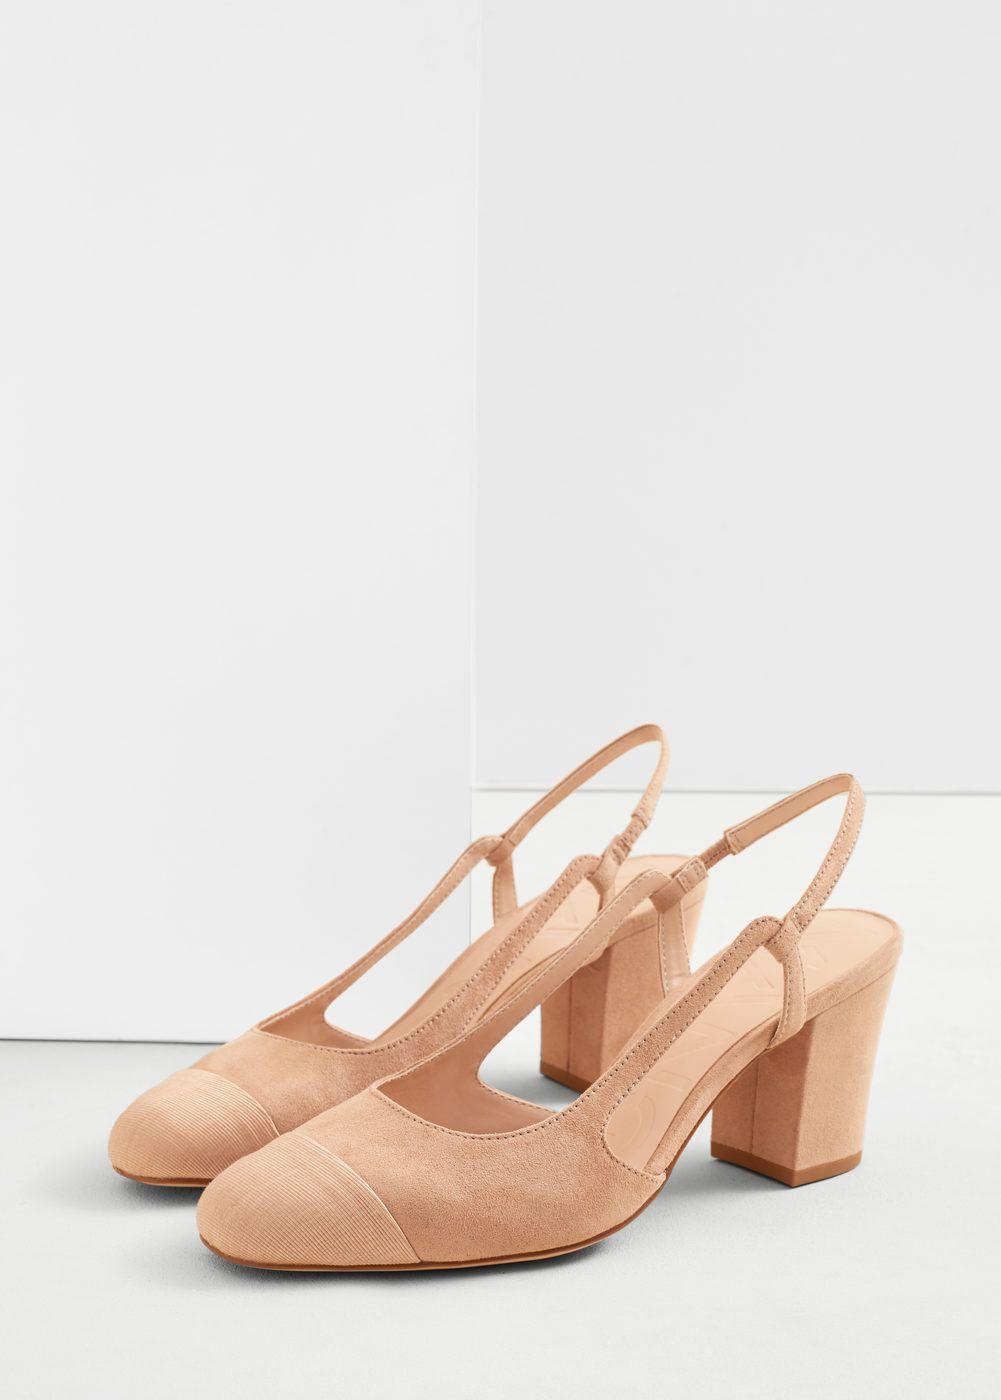 dc49ef2d3a2 Ξώφτερνα παπούτσια με τακούνι - Γυναίκα | Ό,τι θέλω να αγοράσω ...